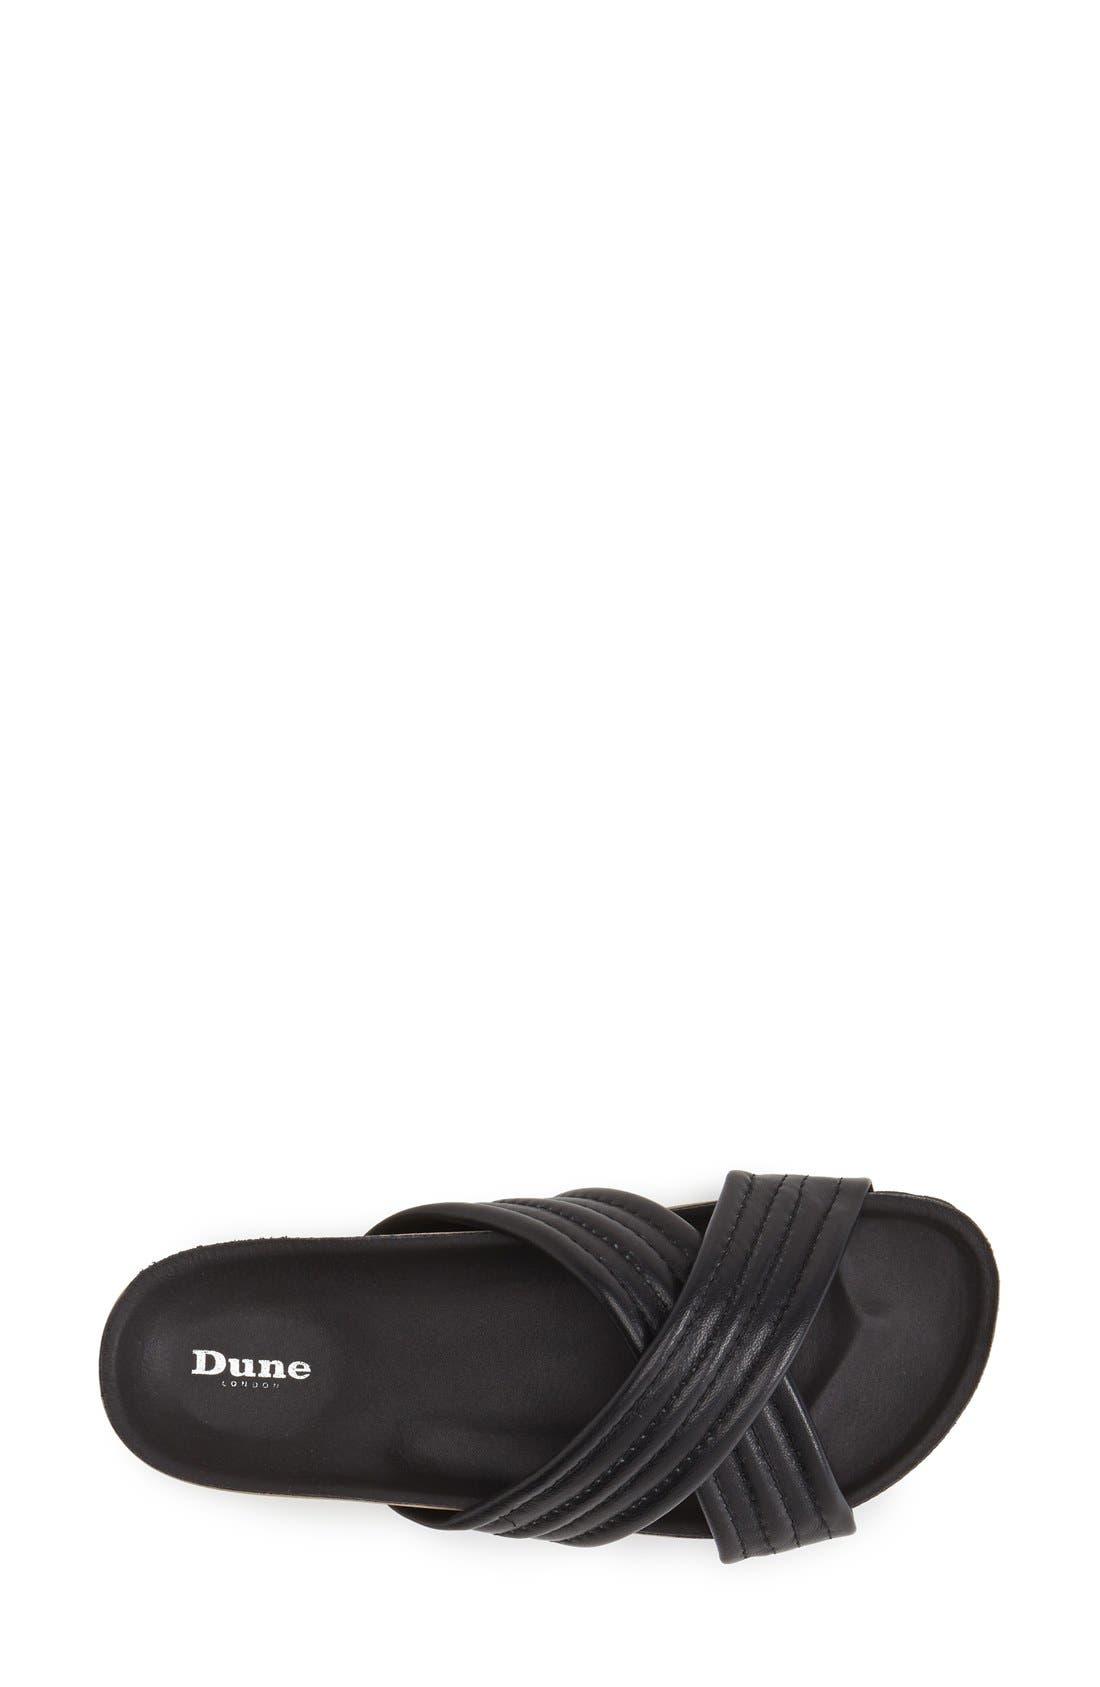 DUNE LONDON, 'Jolenes' Leather Slide Sandal, Alternate thumbnail 3, color, 002